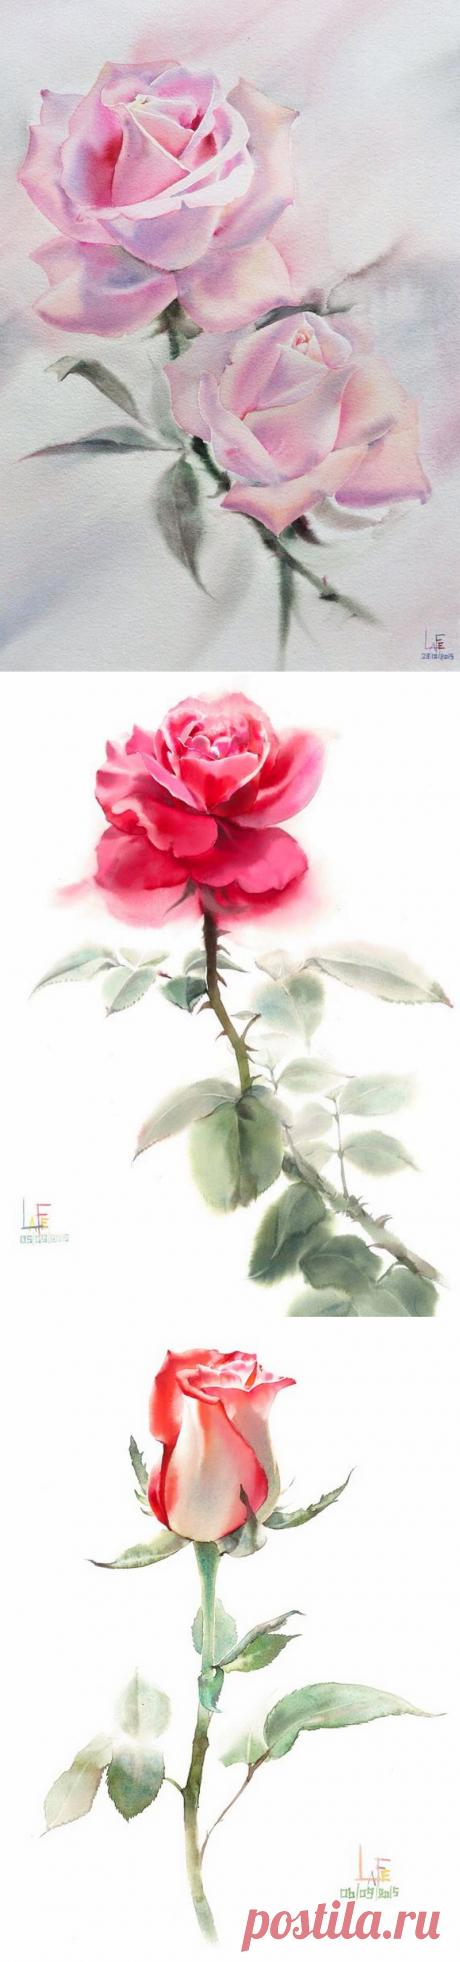 Розы... Художник - акварелист Sattha Homsawat (LaFe), Тайланд.